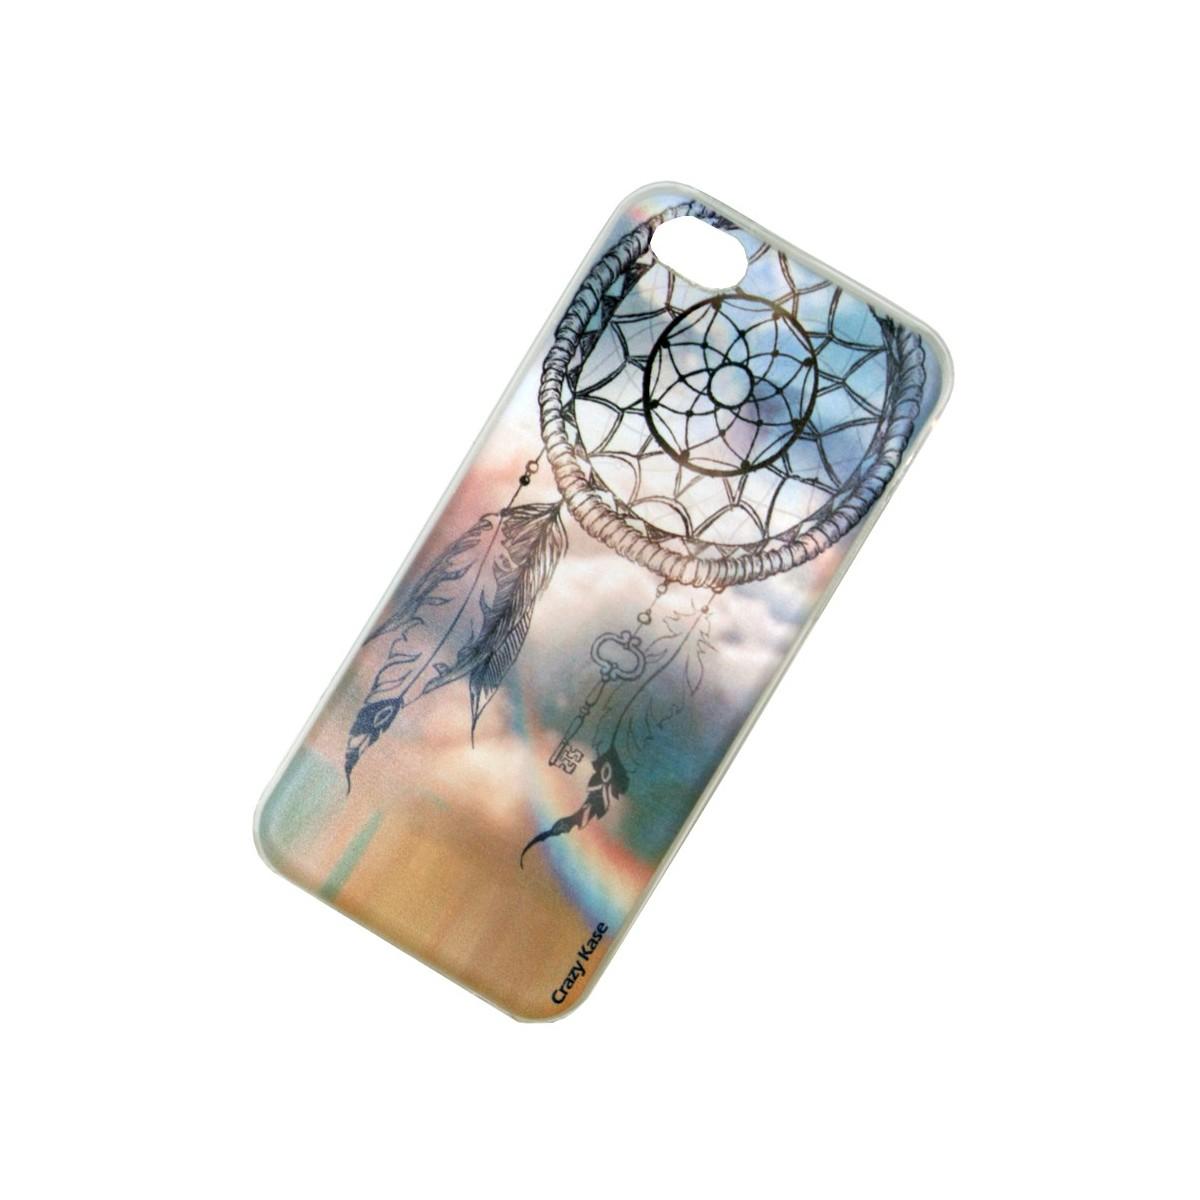 Crazy Kase - Coque iPhone 5C motif Attrape Rêve